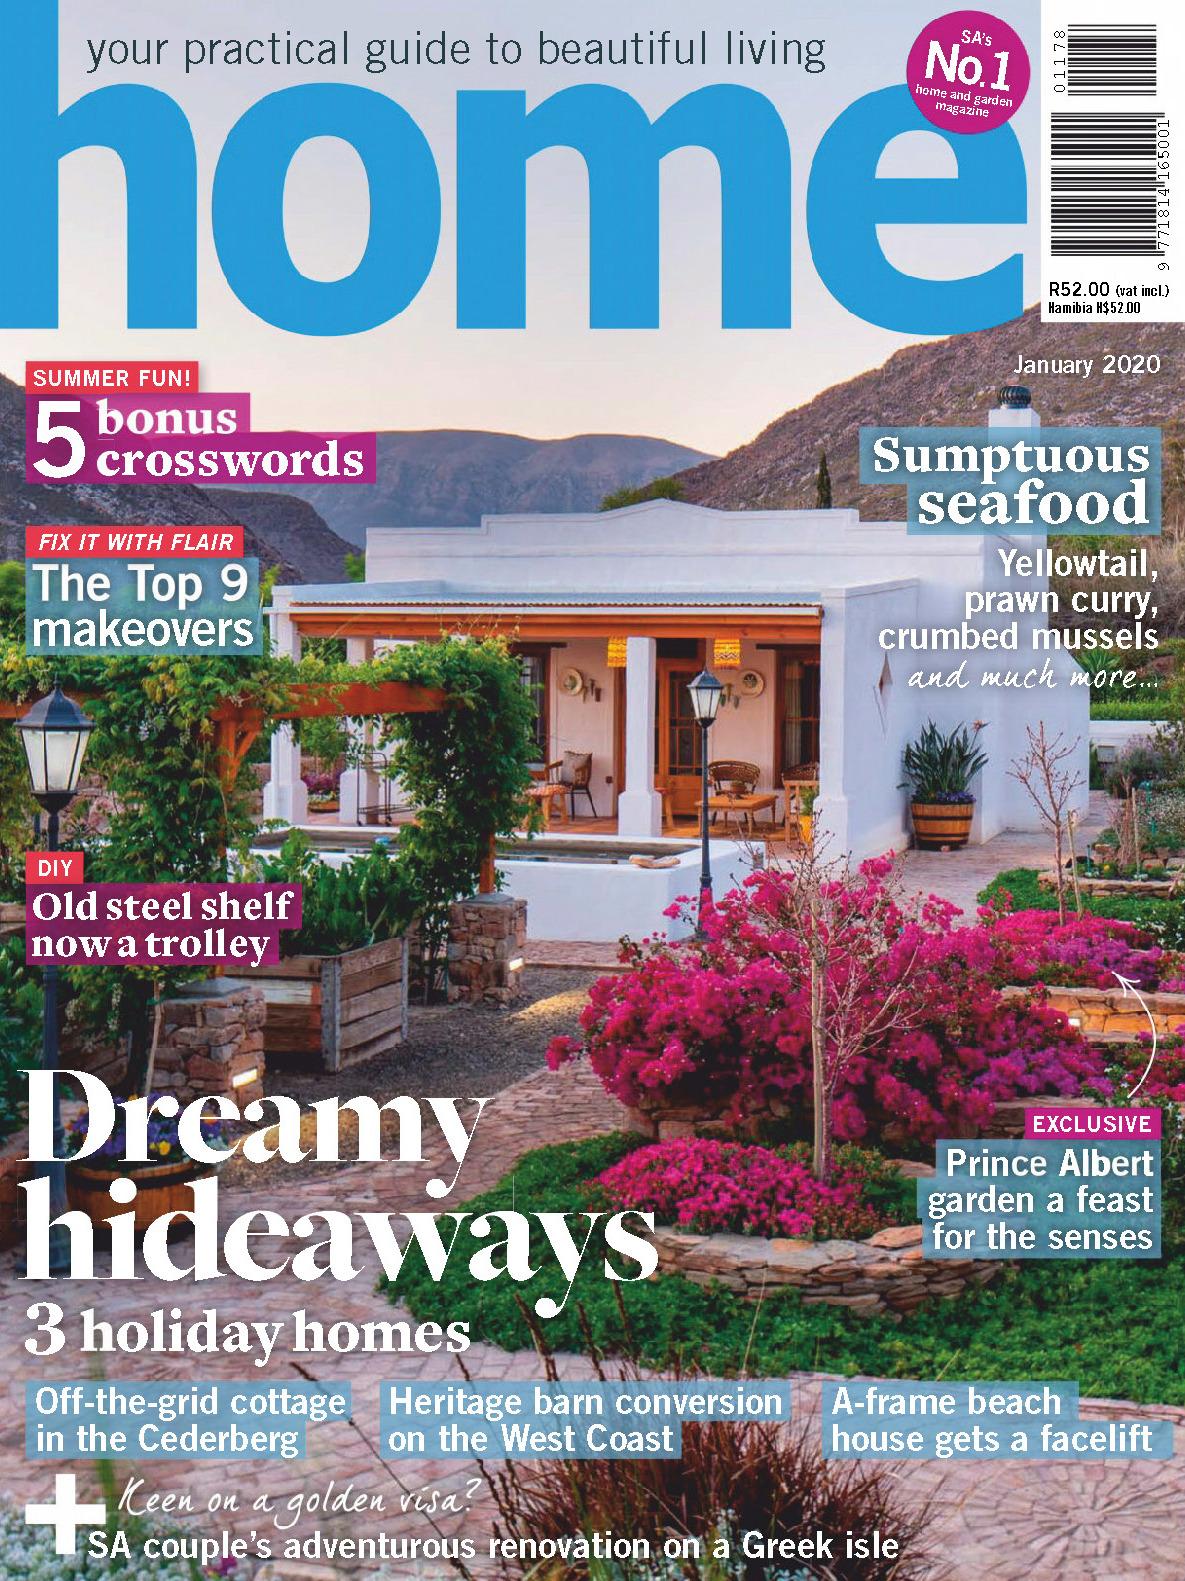 《Home》南非版时尚家居杂志2020年01月号